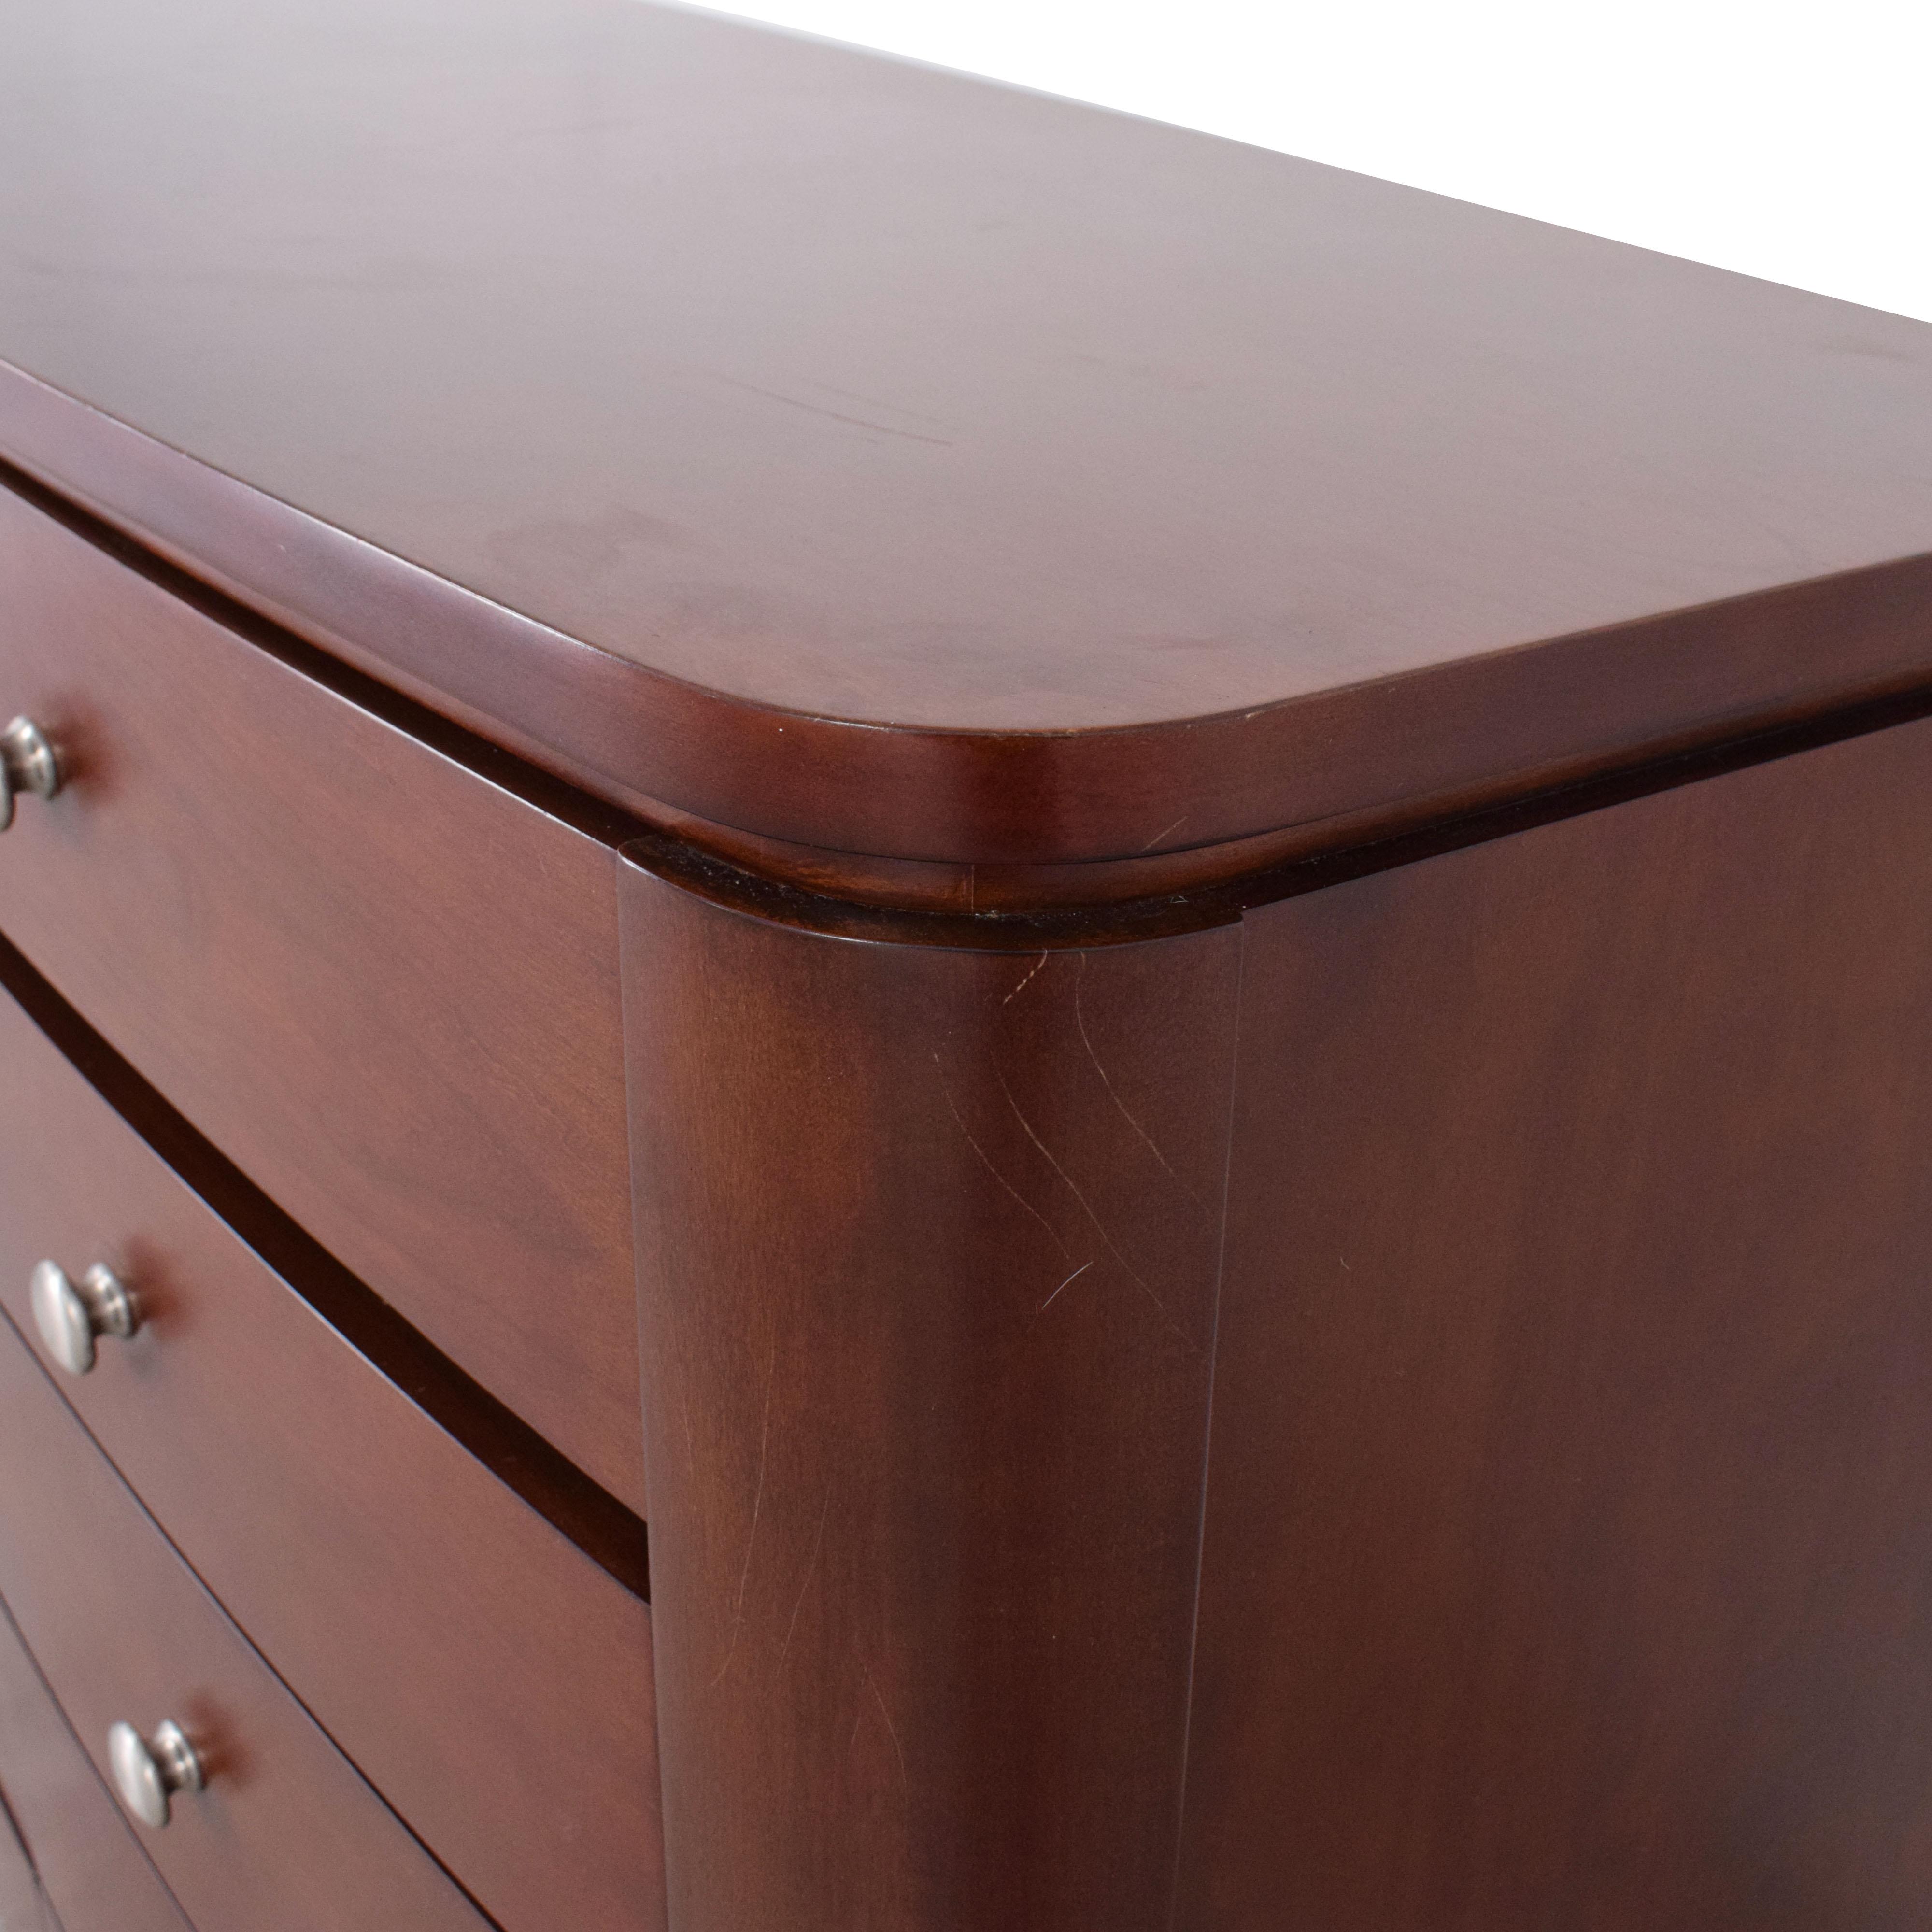 Macy's Macy's High Ten Drawer Dresser used